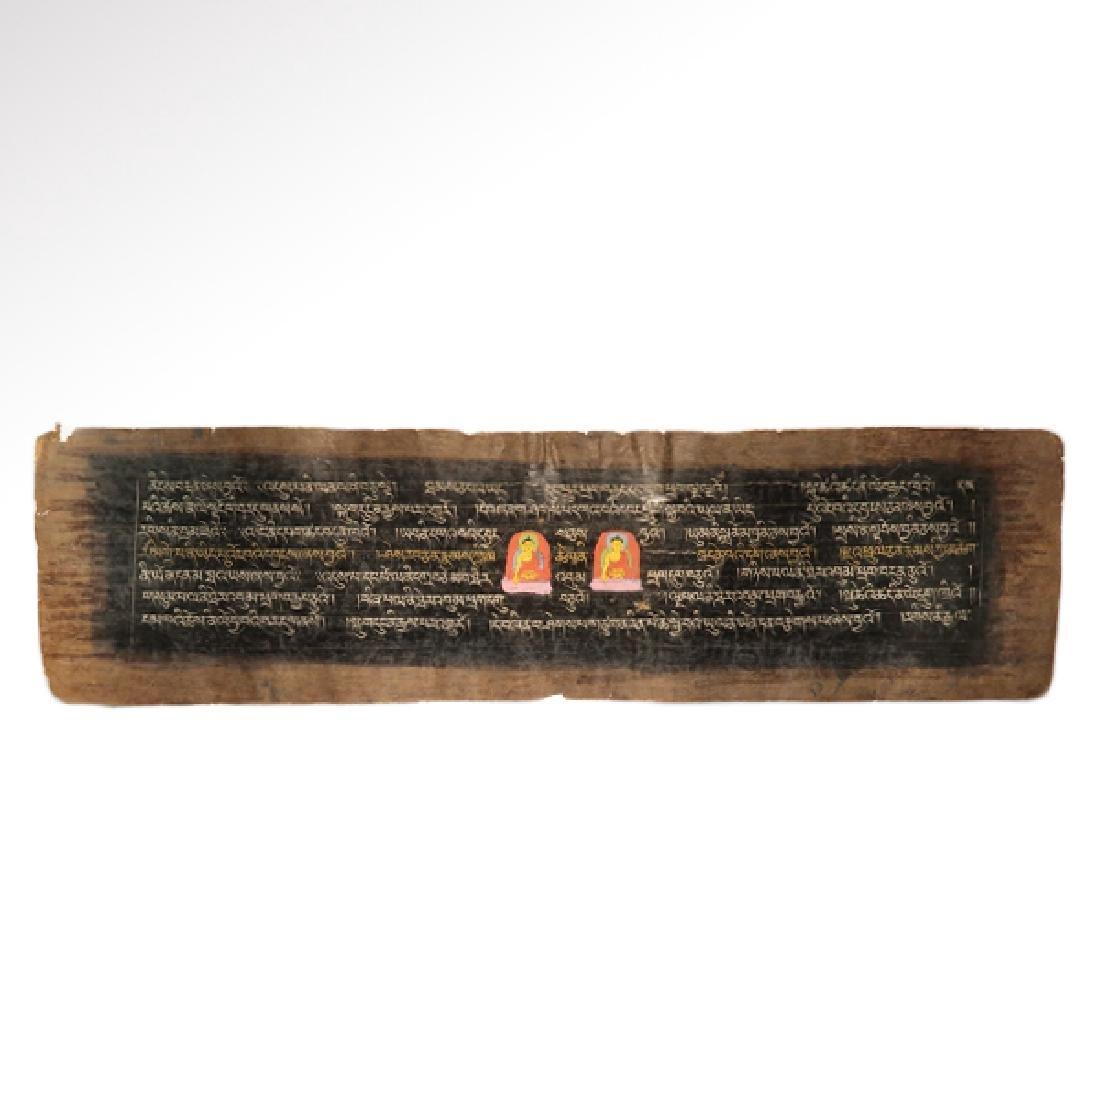 Tibetan Sutra Manuscript, c. 17th Century A.D.